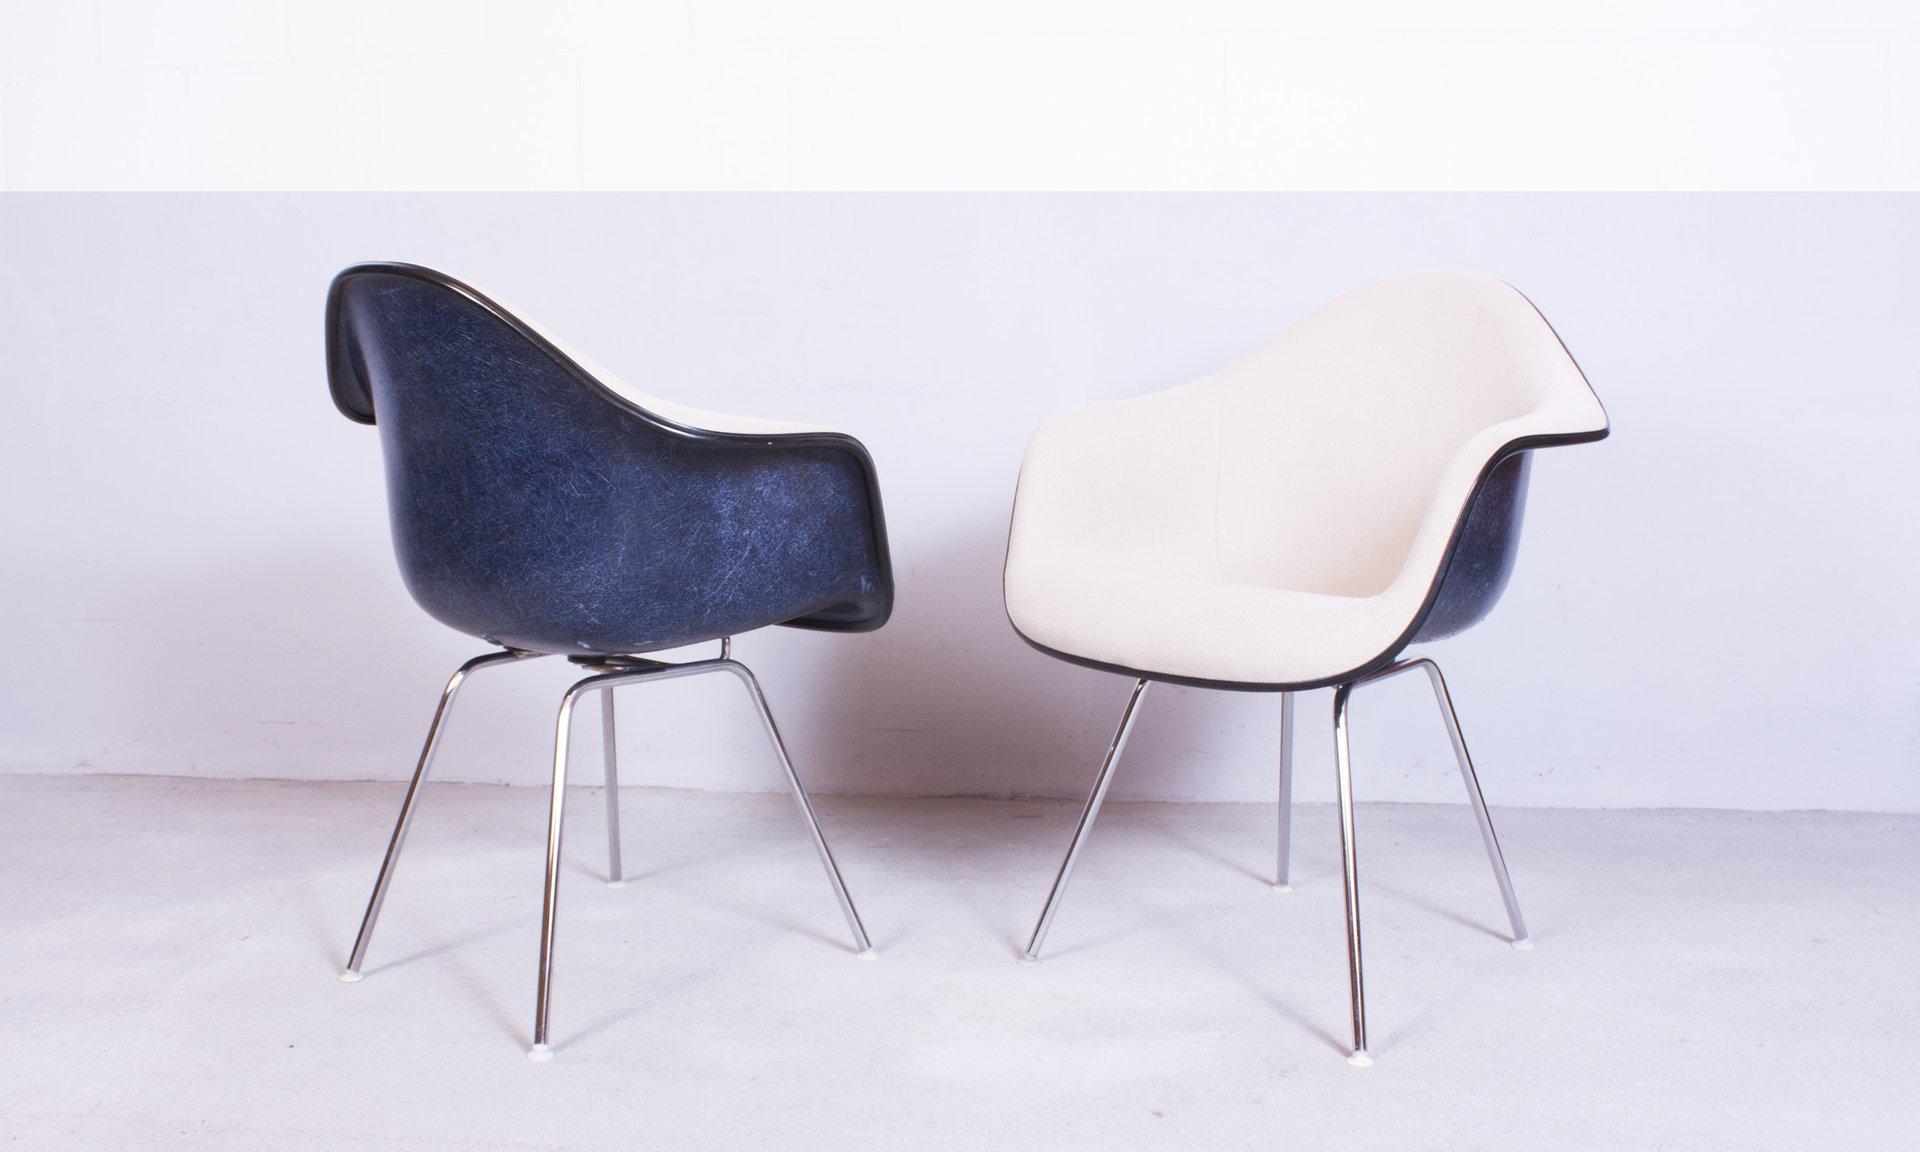 modell dax stuhl von charles ray eames f r herman miller 1952 2er set bei pamono kaufen. Black Bedroom Furniture Sets. Home Design Ideas